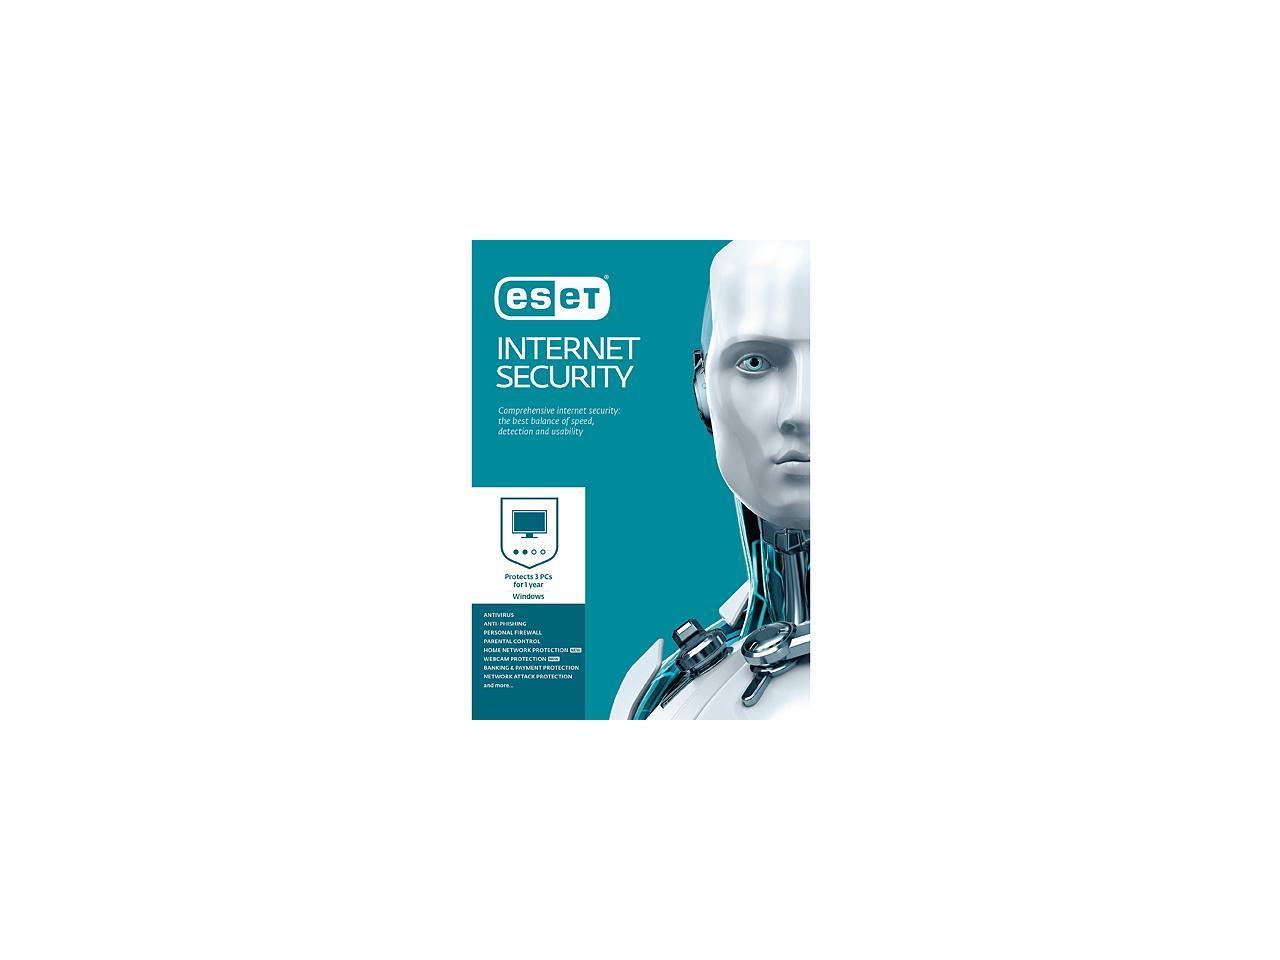 ESET Internet Security 2017 - 3 PCs (Free upgrade to 2018) Use Promo code 705MQTYS60 $24.02